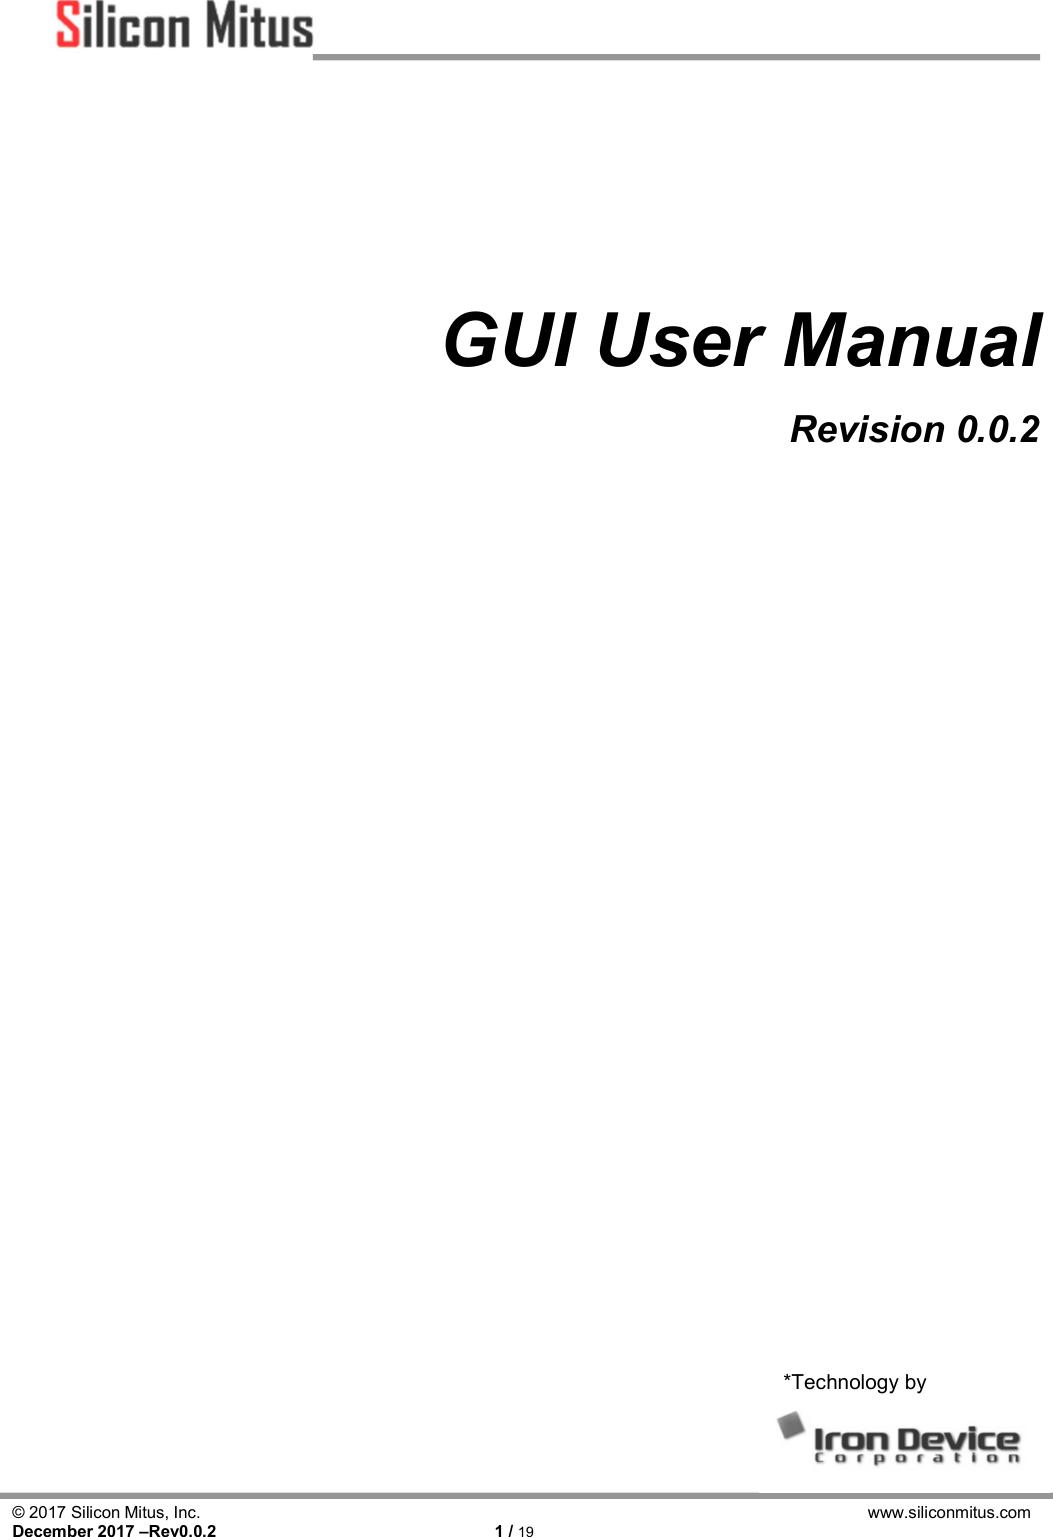 SMA1301_GUI_User_Manual_Rev0.0.2x SMA1301 GUI User Manual